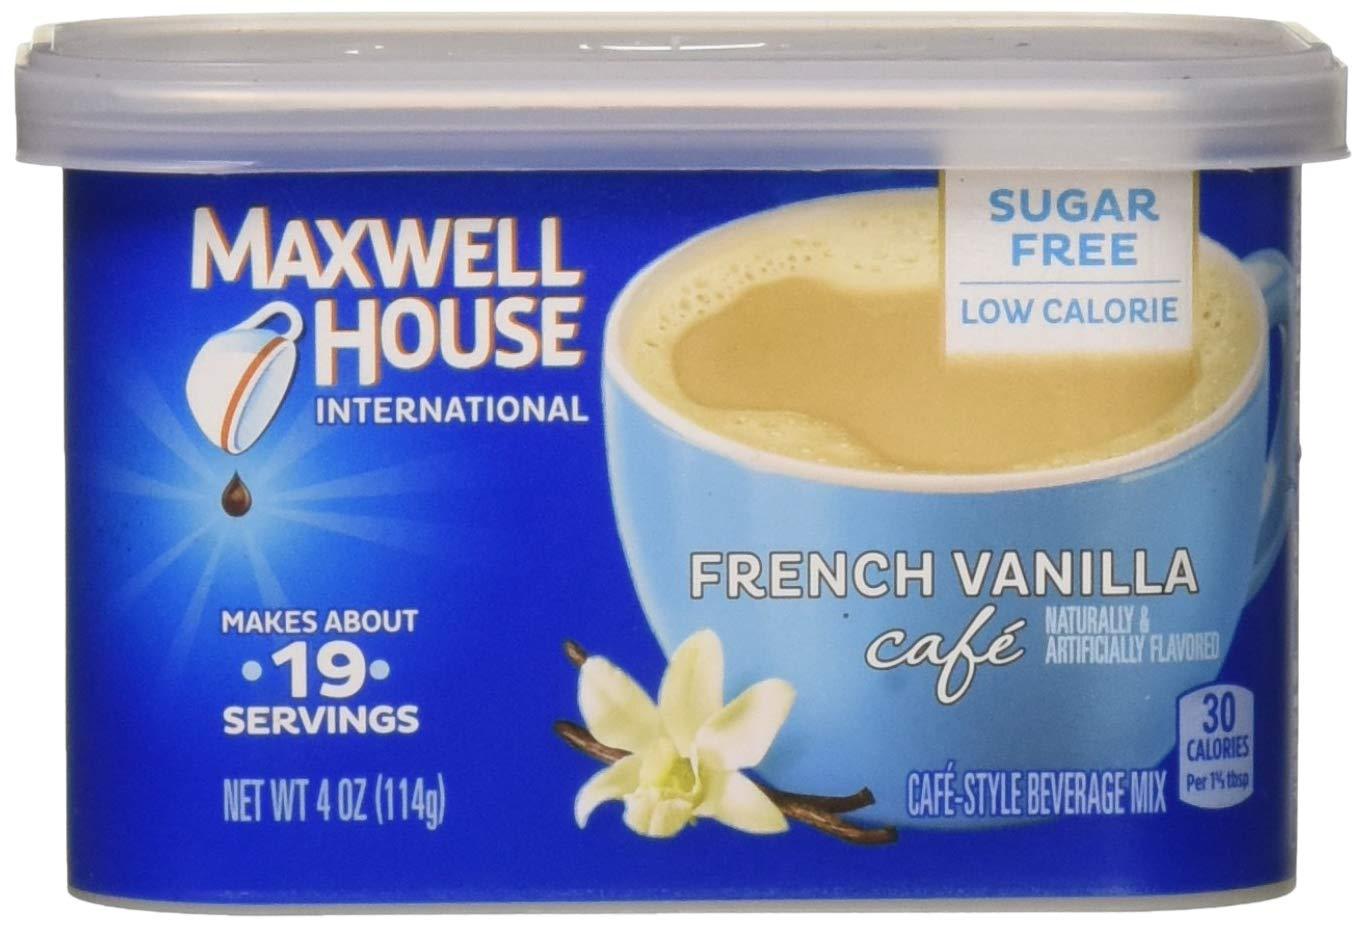 Maxwell House International Cafe Cafe-Style Beverage Mix, Sugar Free, French Vanilla Cafe, 4 oz